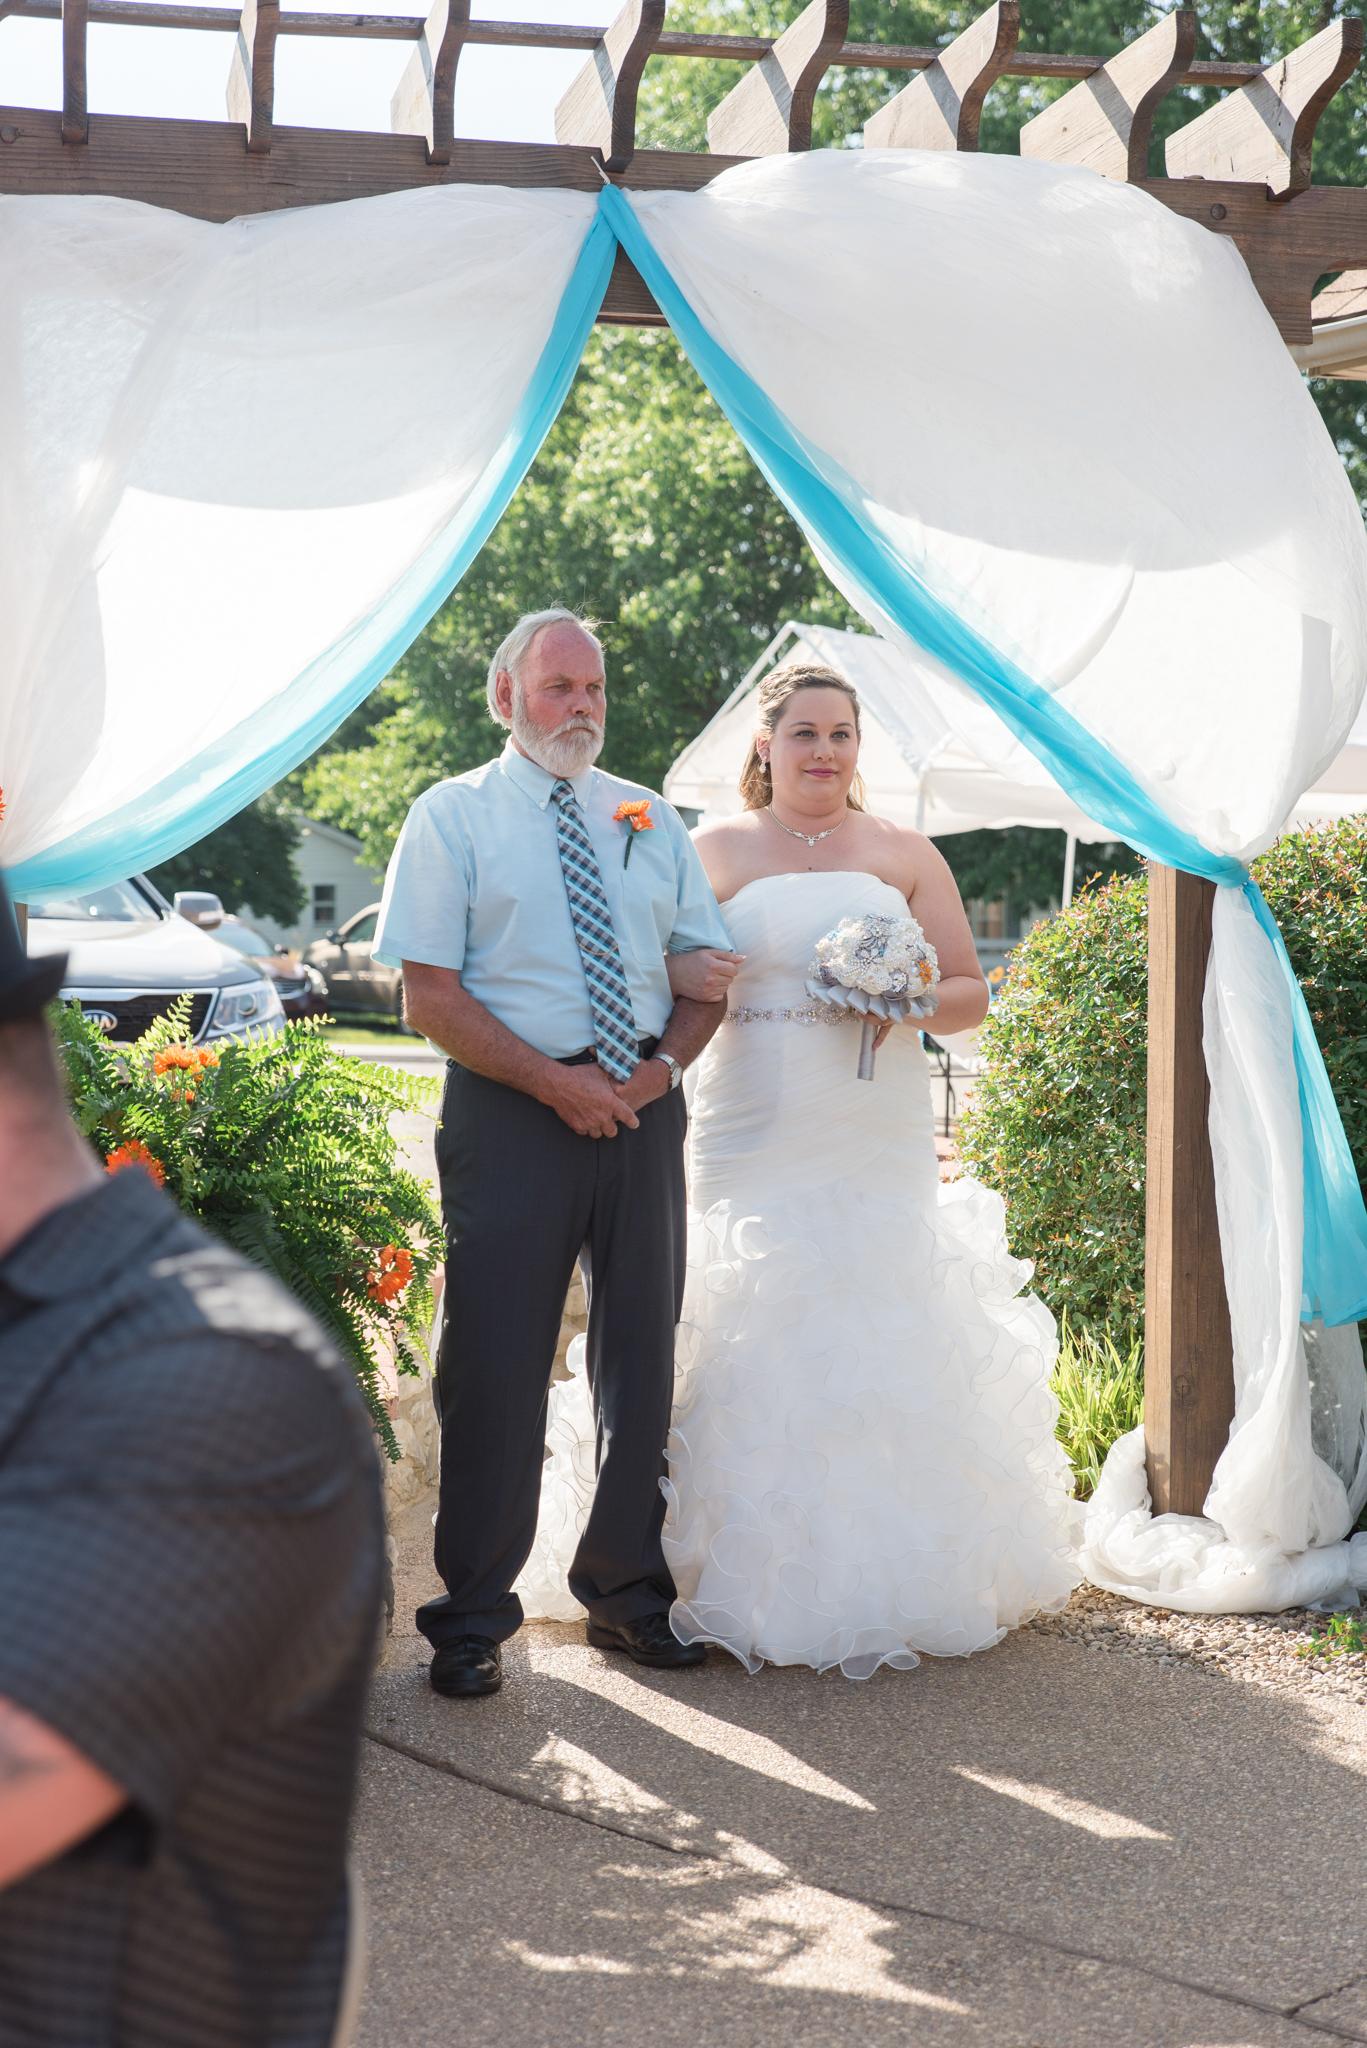 Kentucky bride, KY wedding photographer, Kentucky wedding, Winchester KY, Winchester KY wedding photographer